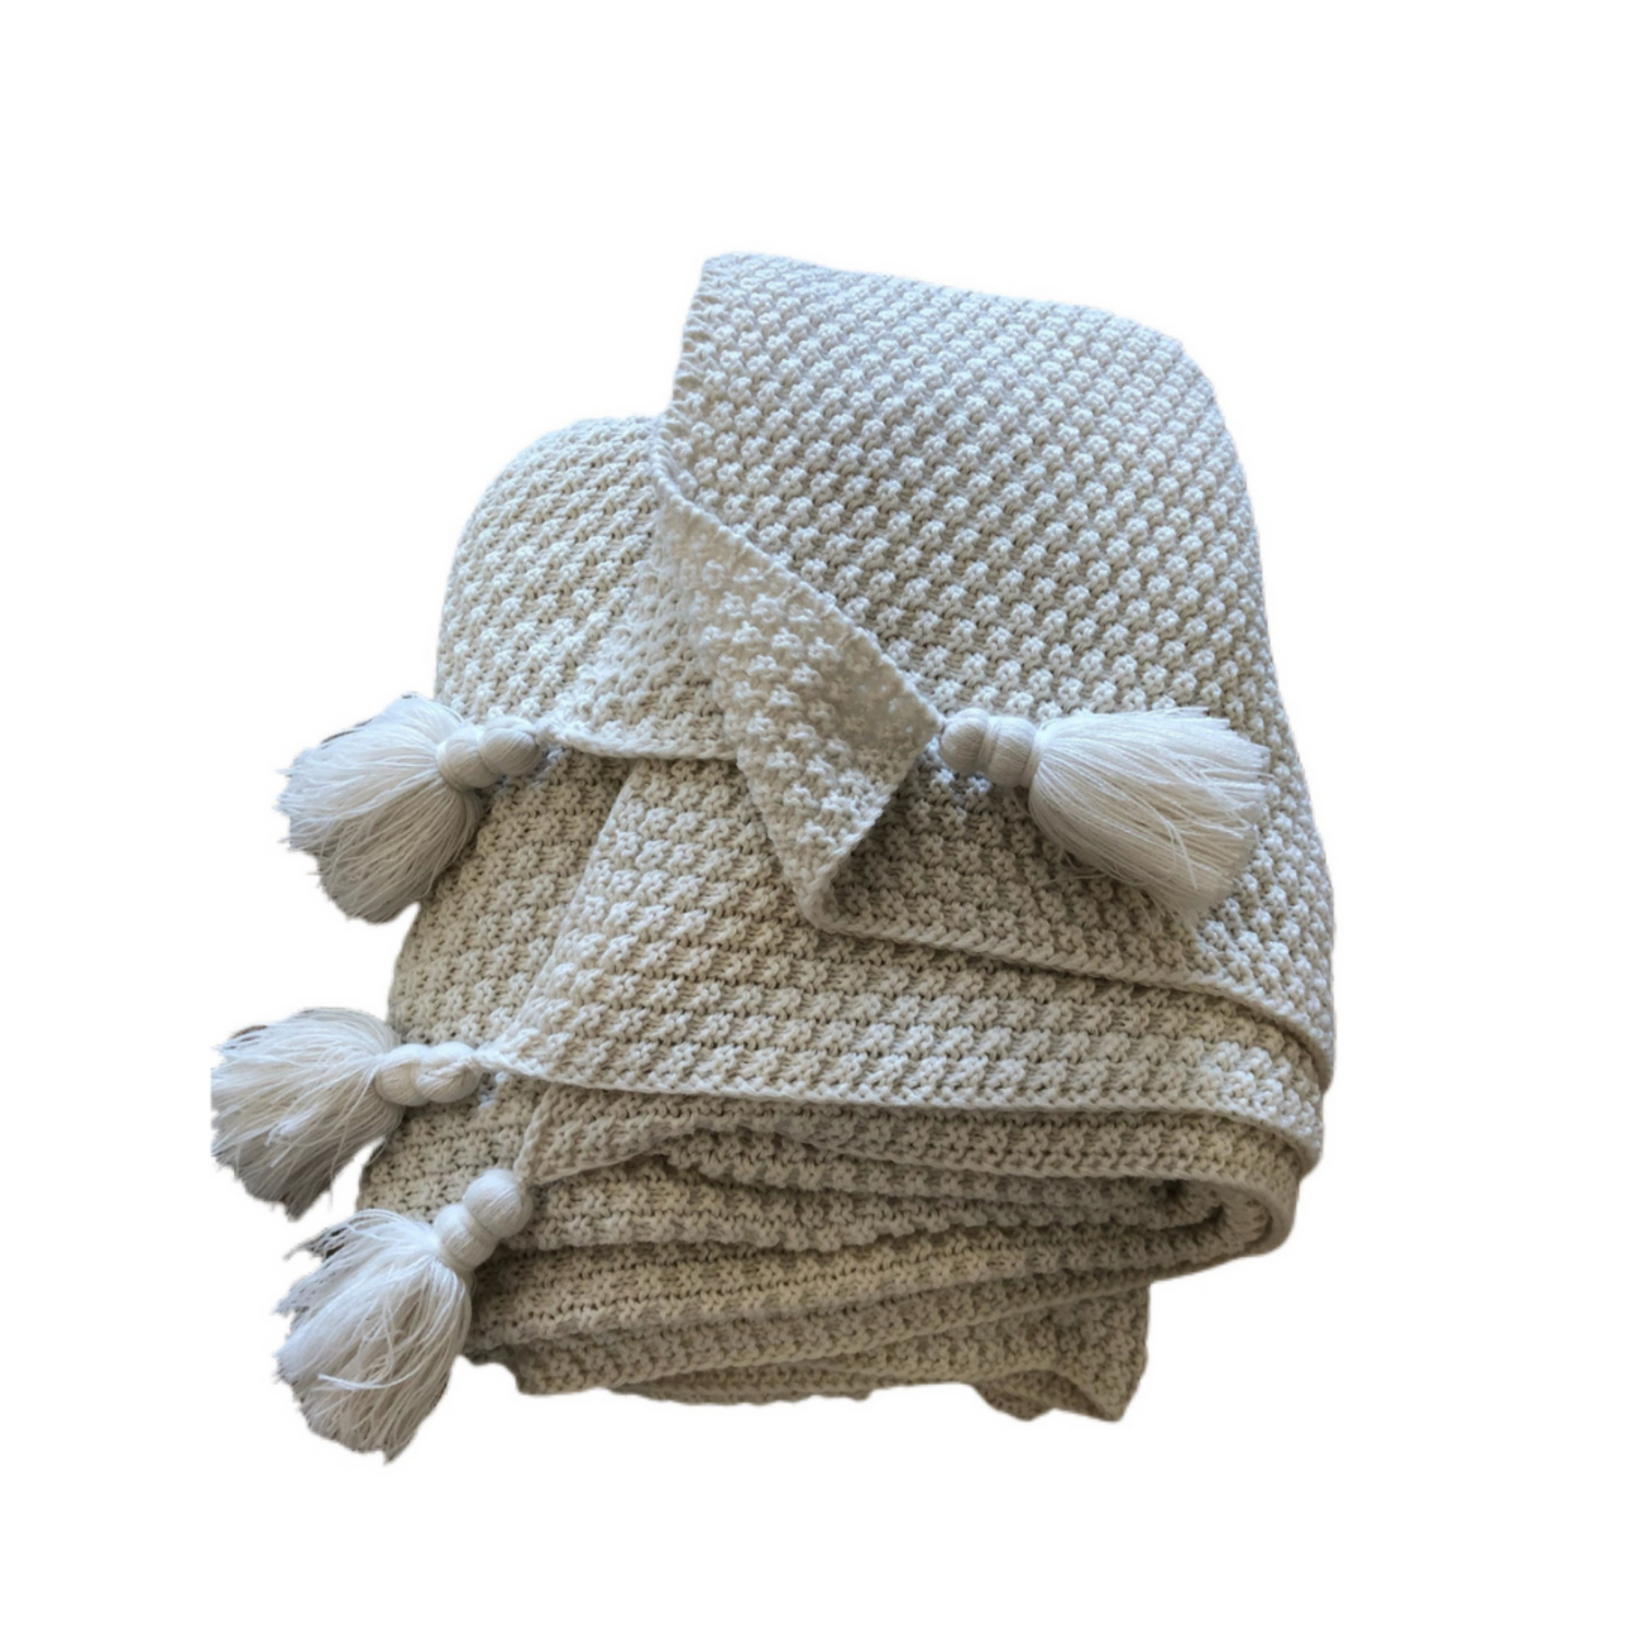 Wyld Blue Home Knit Blanket White w/ Tassle